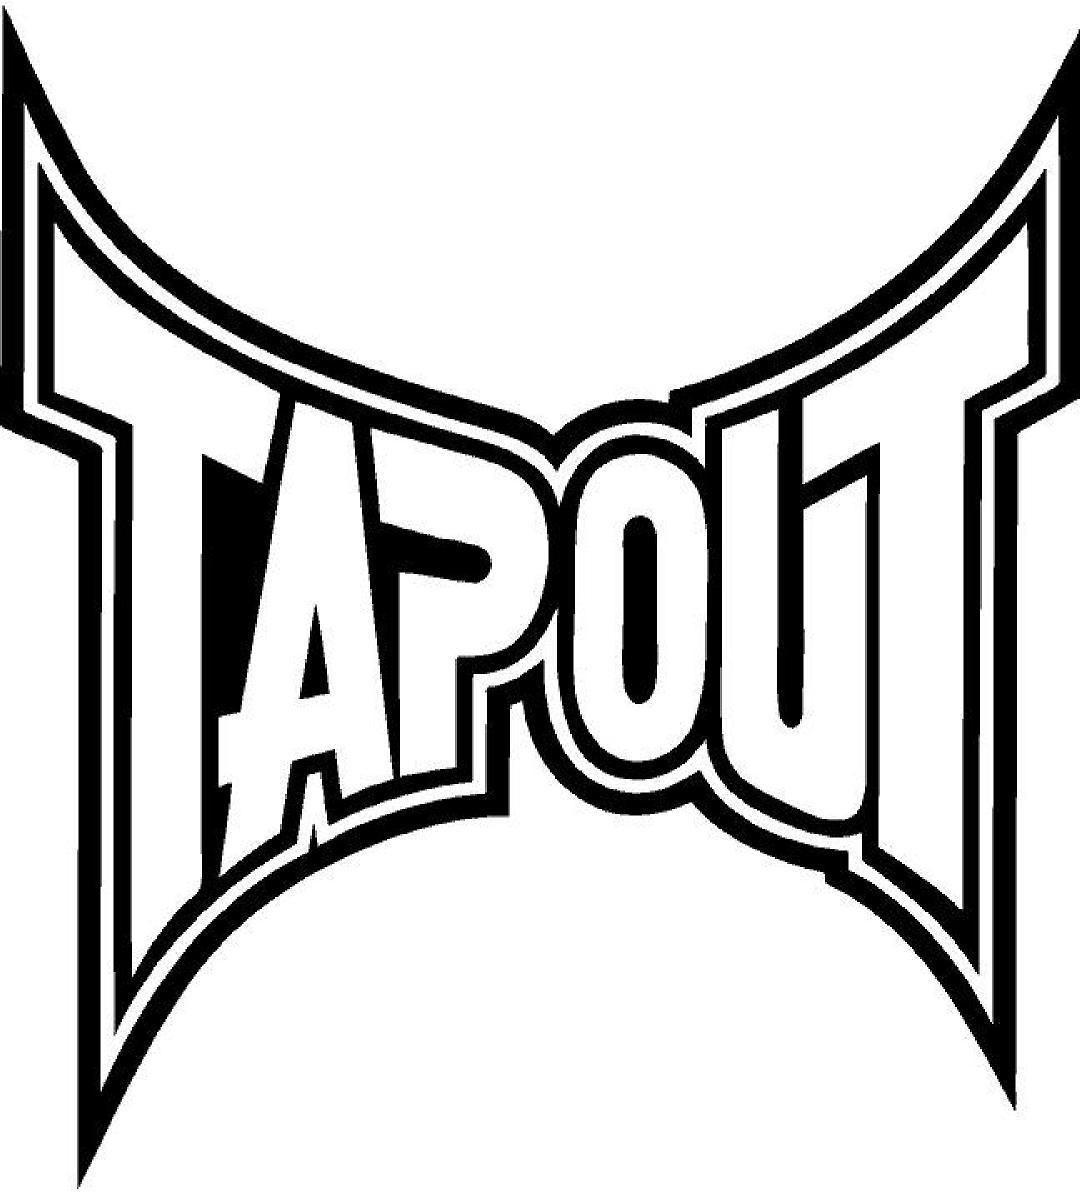 0 99 Tapout Vinyl Decal Sticker Free Shipping Ebay Home Garden Vector Logo Vinyl Decals Logos [ 1192 x 1080 Pixel ]